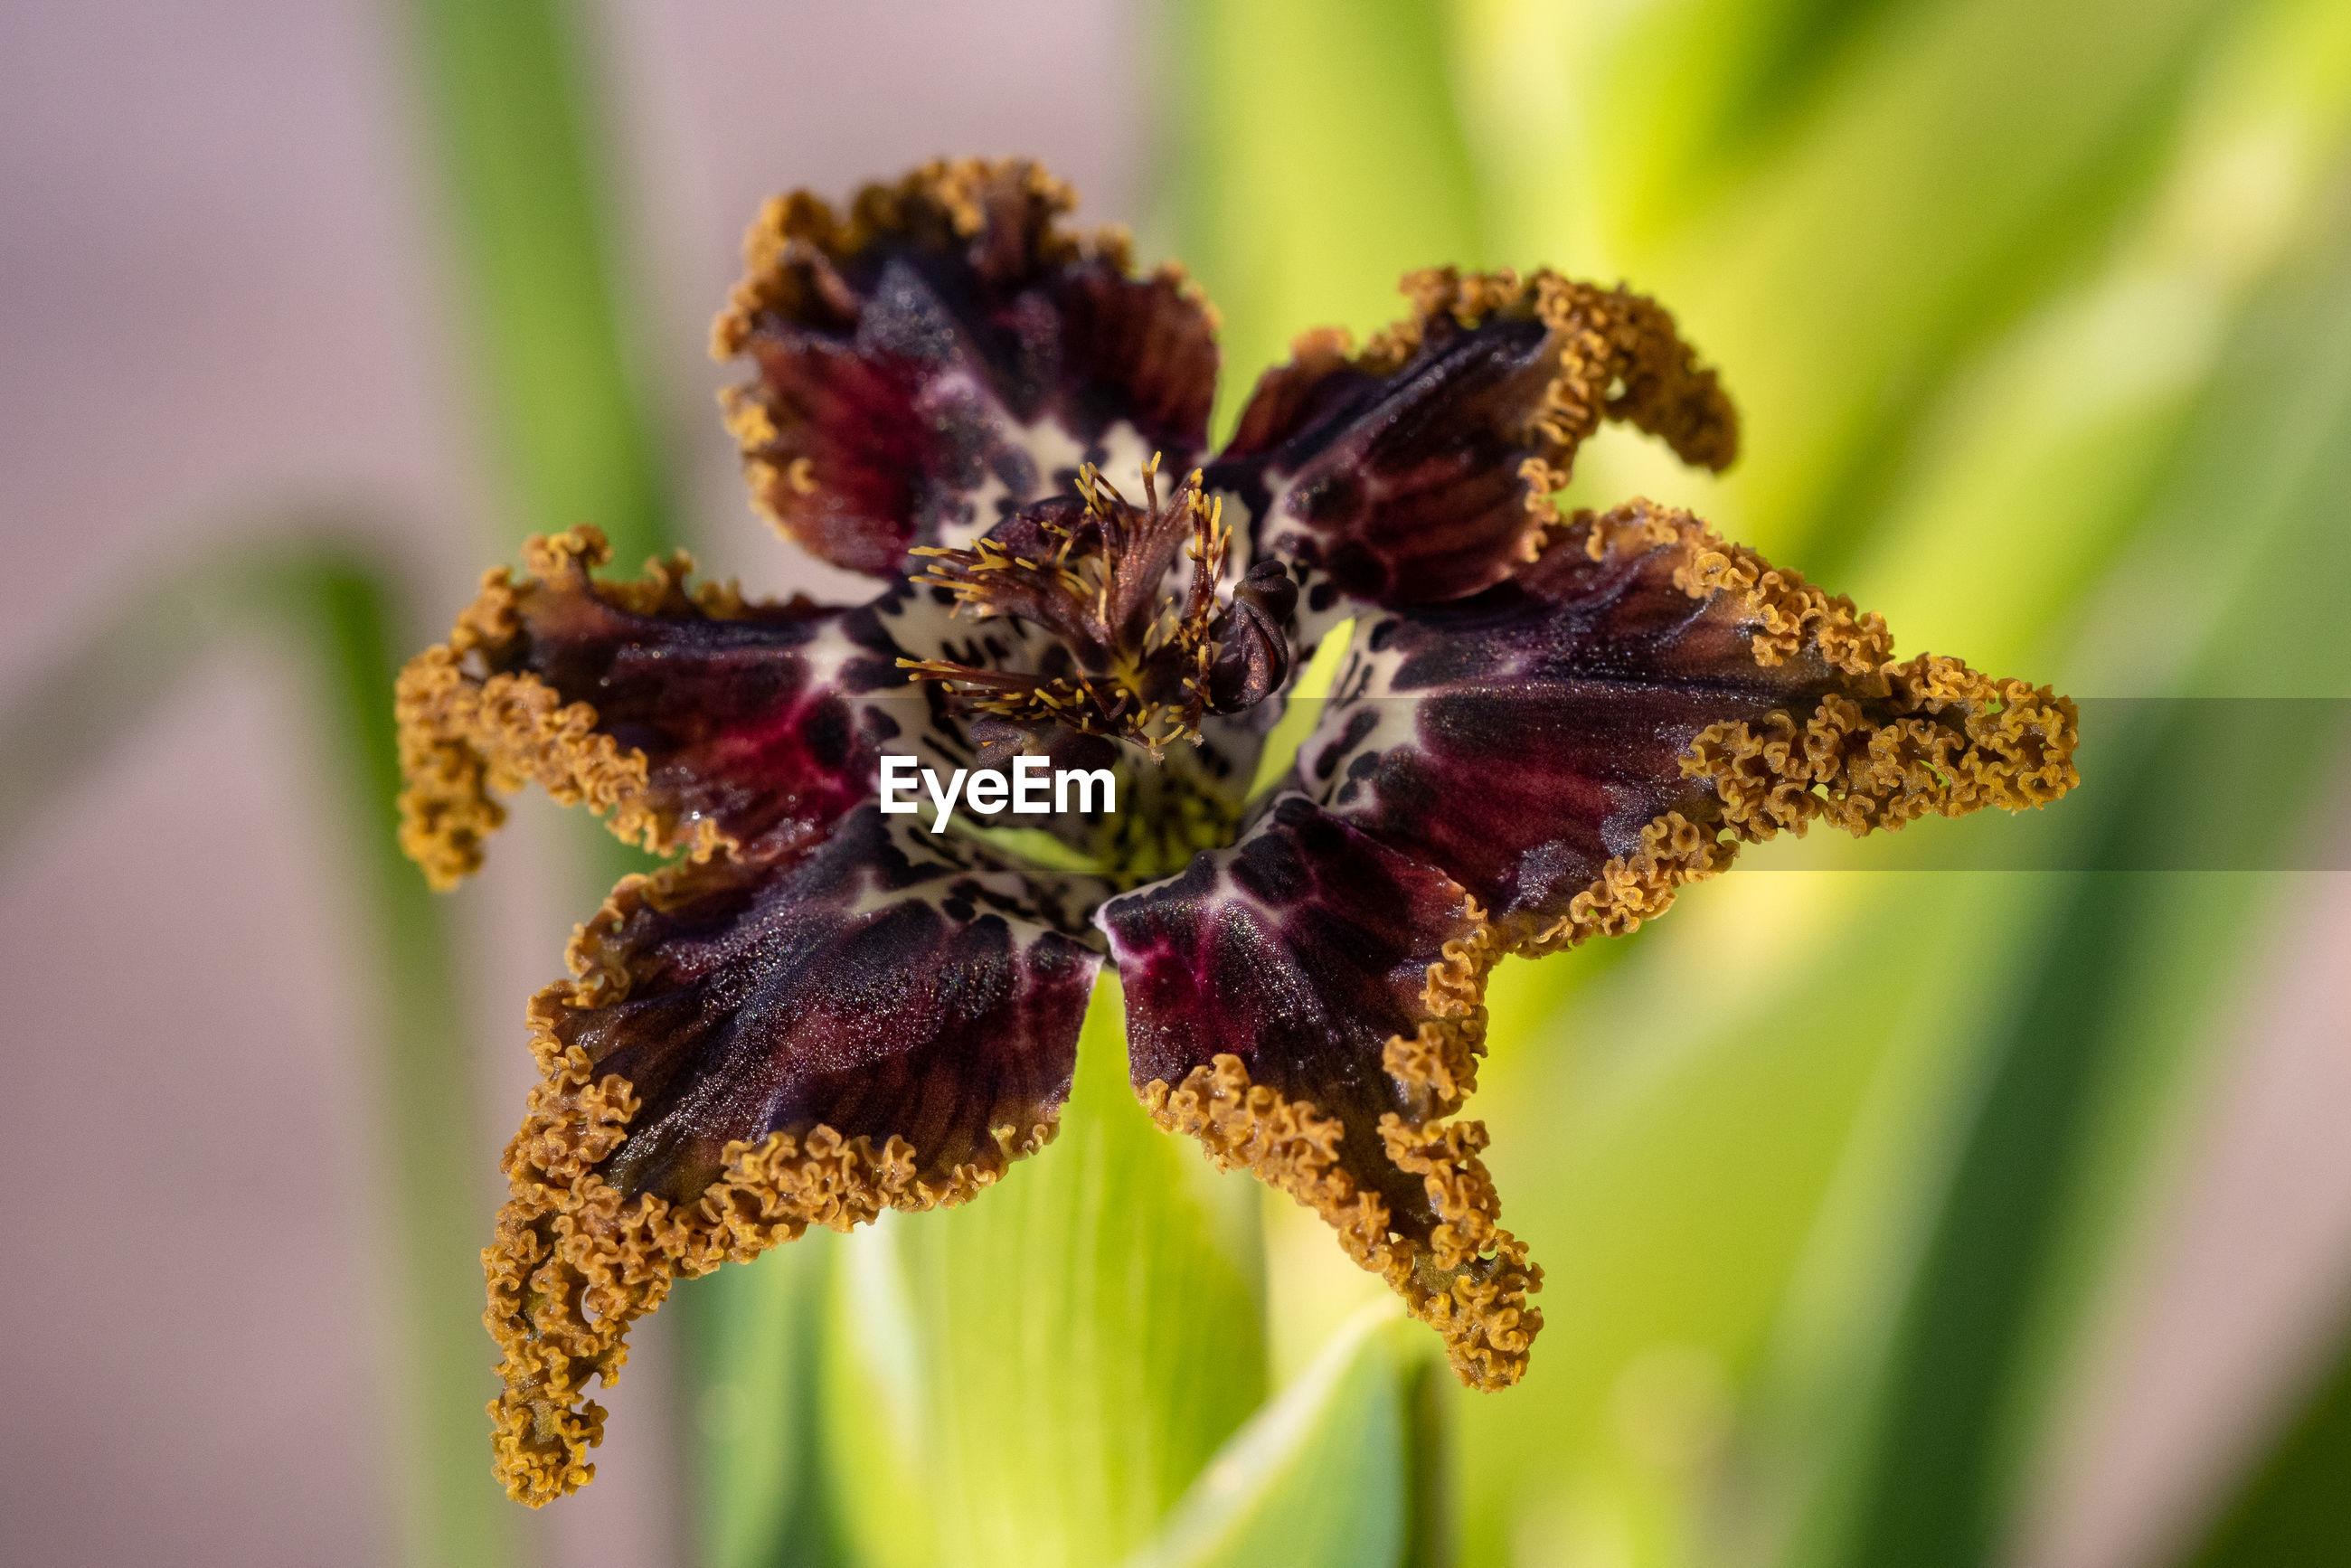 The exotic flower of ferraria crispa, a relative of iris.